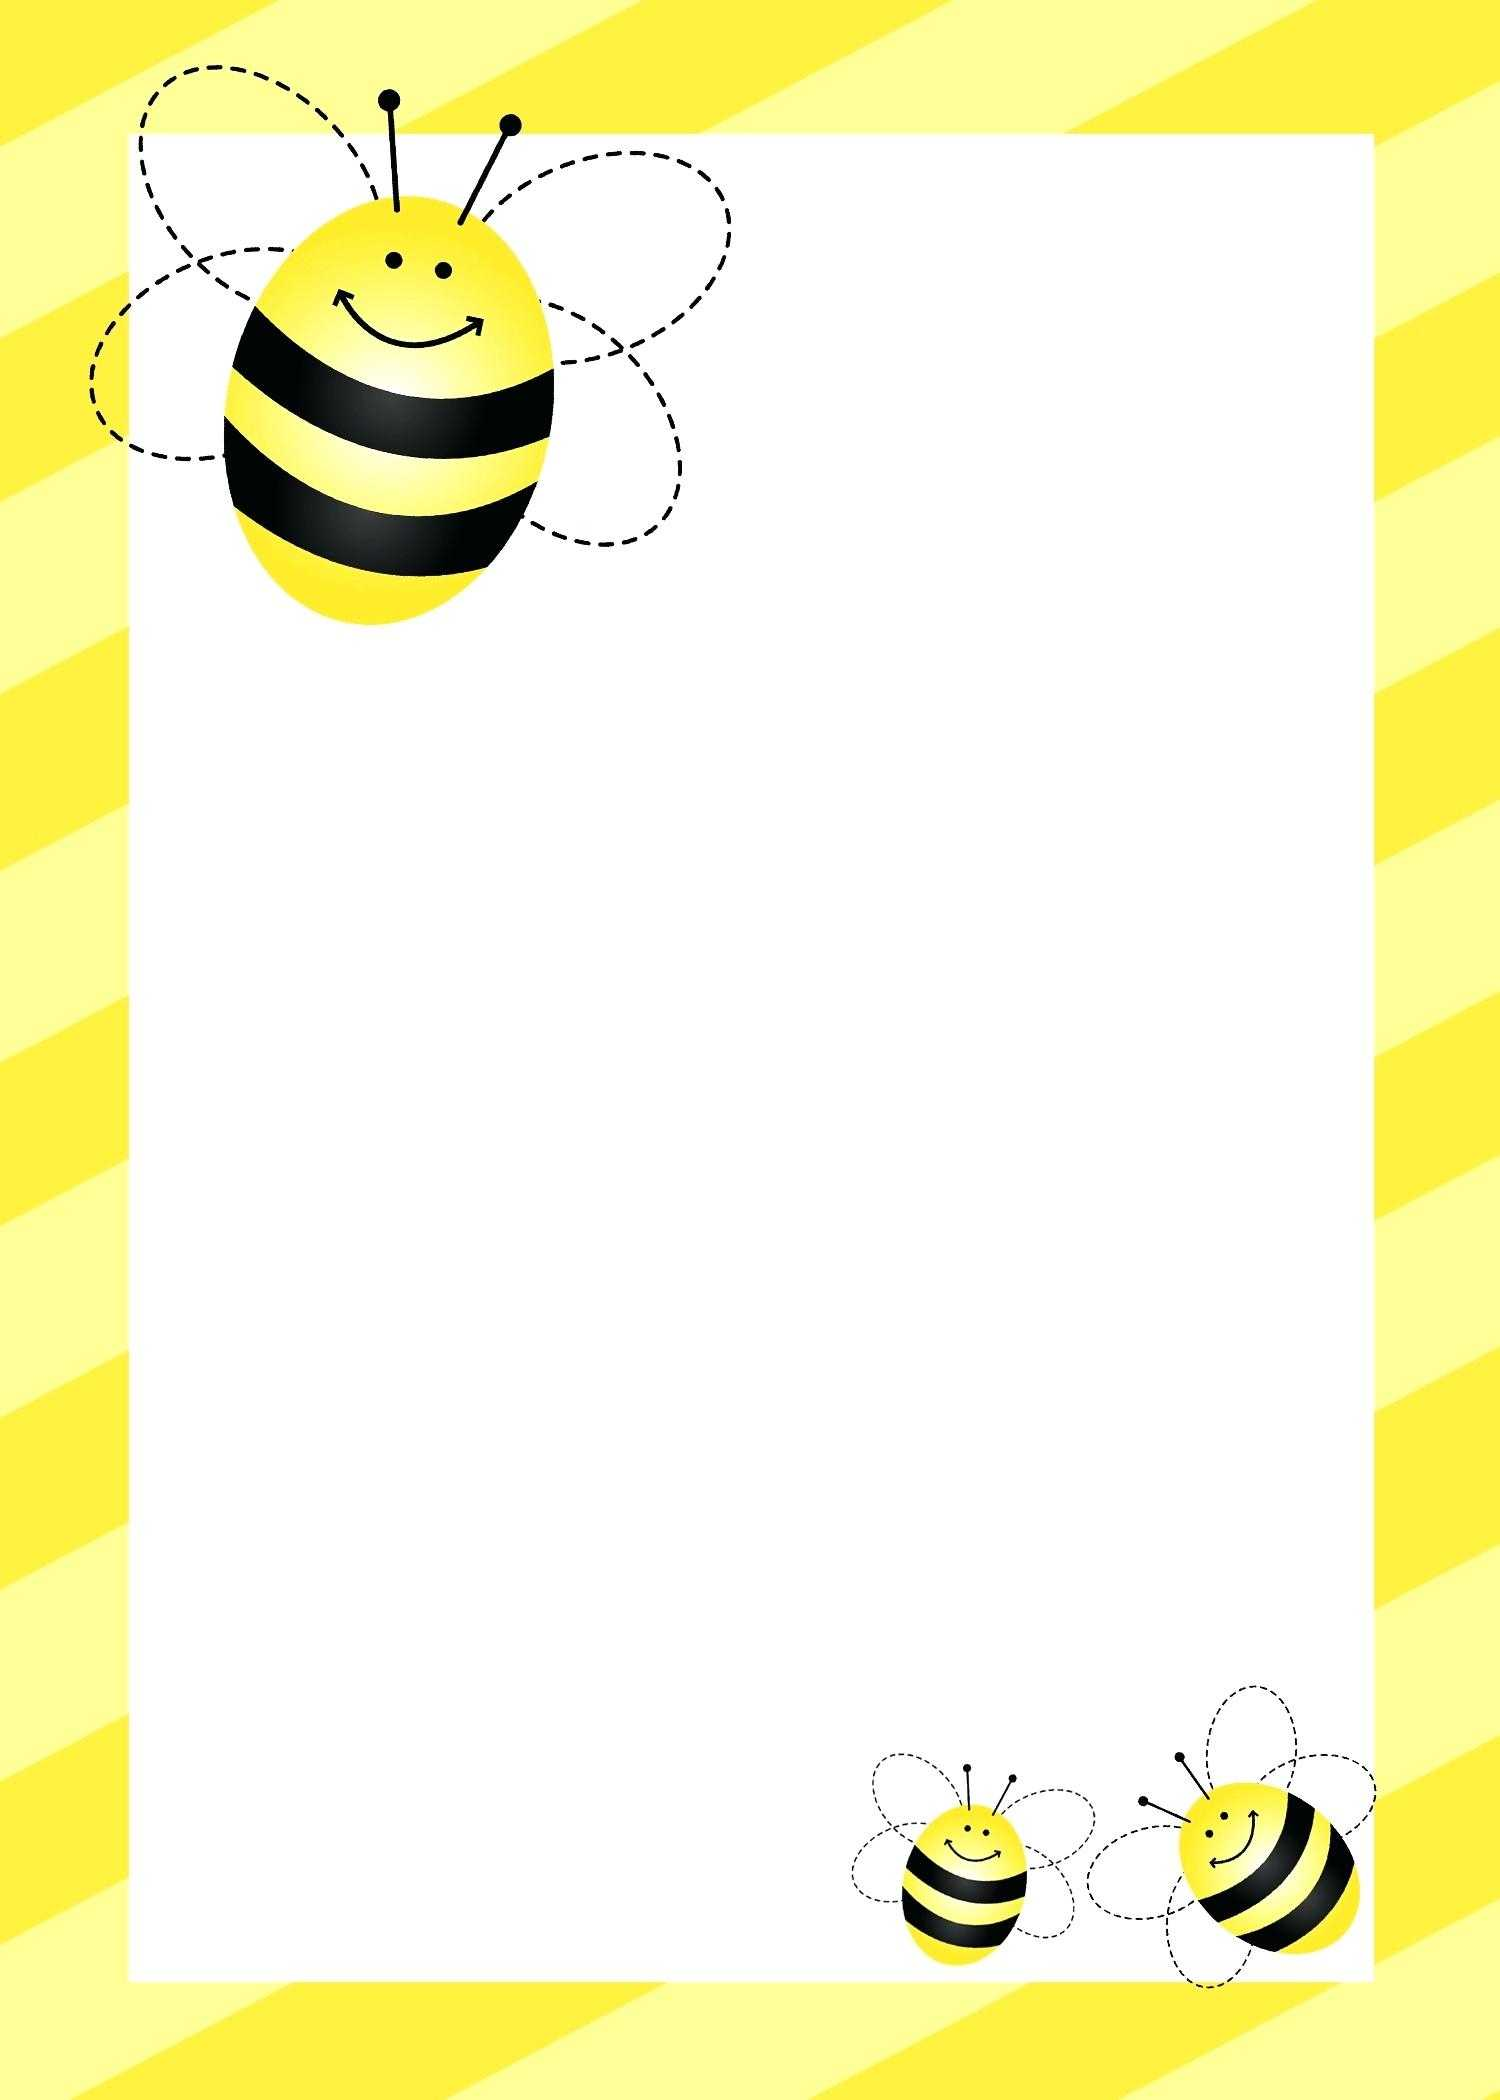 Certificate Clipart Spelling Bee, Certificate Spelling Bee Throughout Spelling Bee Award Certificate Template